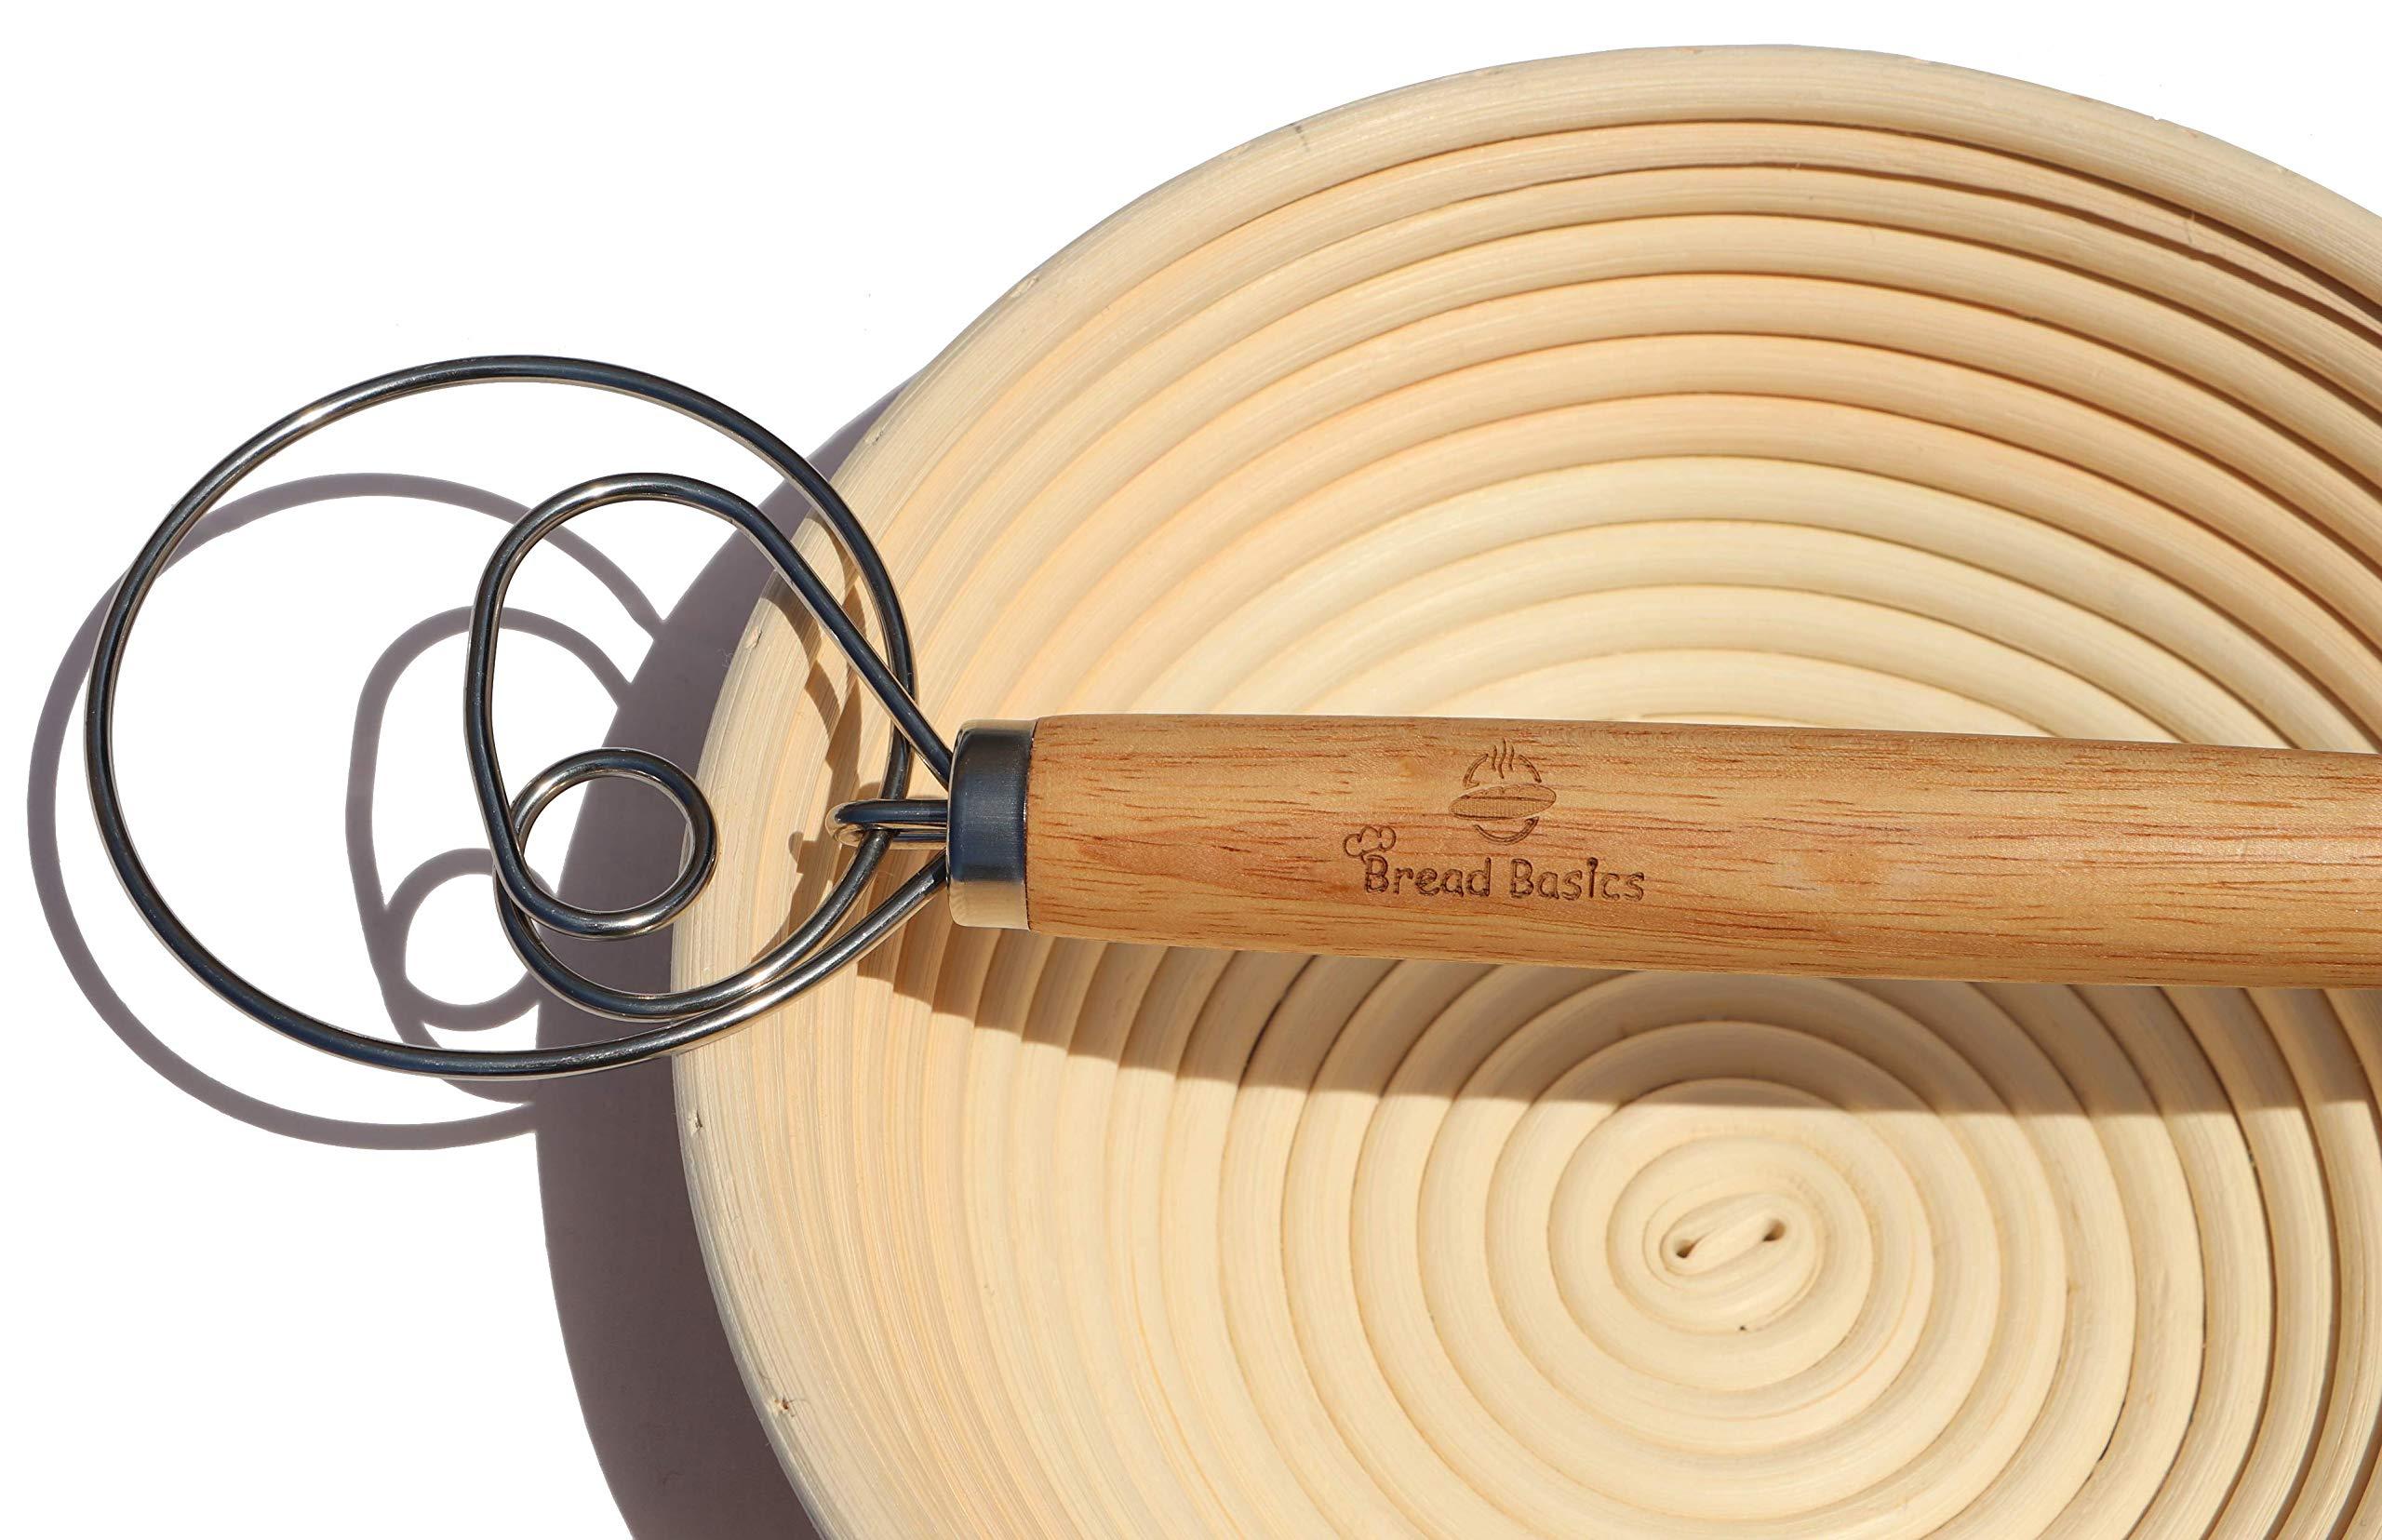 BreadBasics Banneton Proofing Basket   Premium Homemade Bread Starter Kit for Beginners   Includes Step by Step eBook, Bowl Scraper & Whisk, Lame, Brotform Liner, Cleaning Brush   Sourdough Supplies by BreadBasics (Image #7)